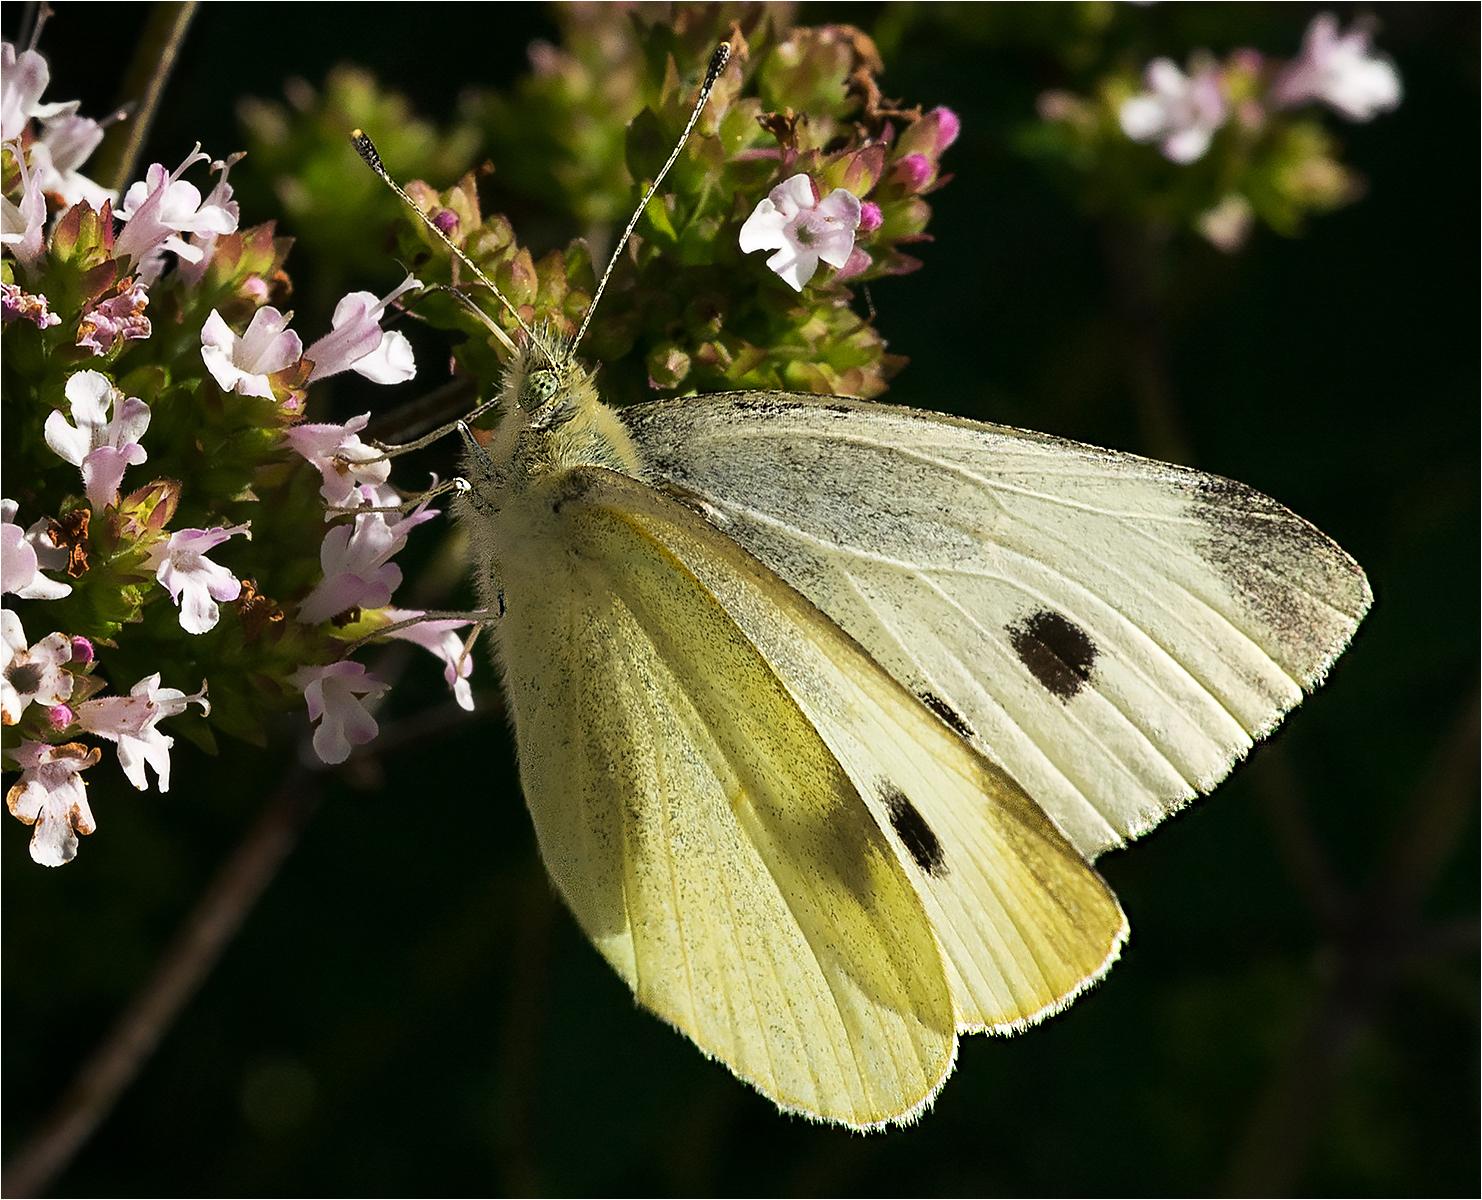 Female Small White